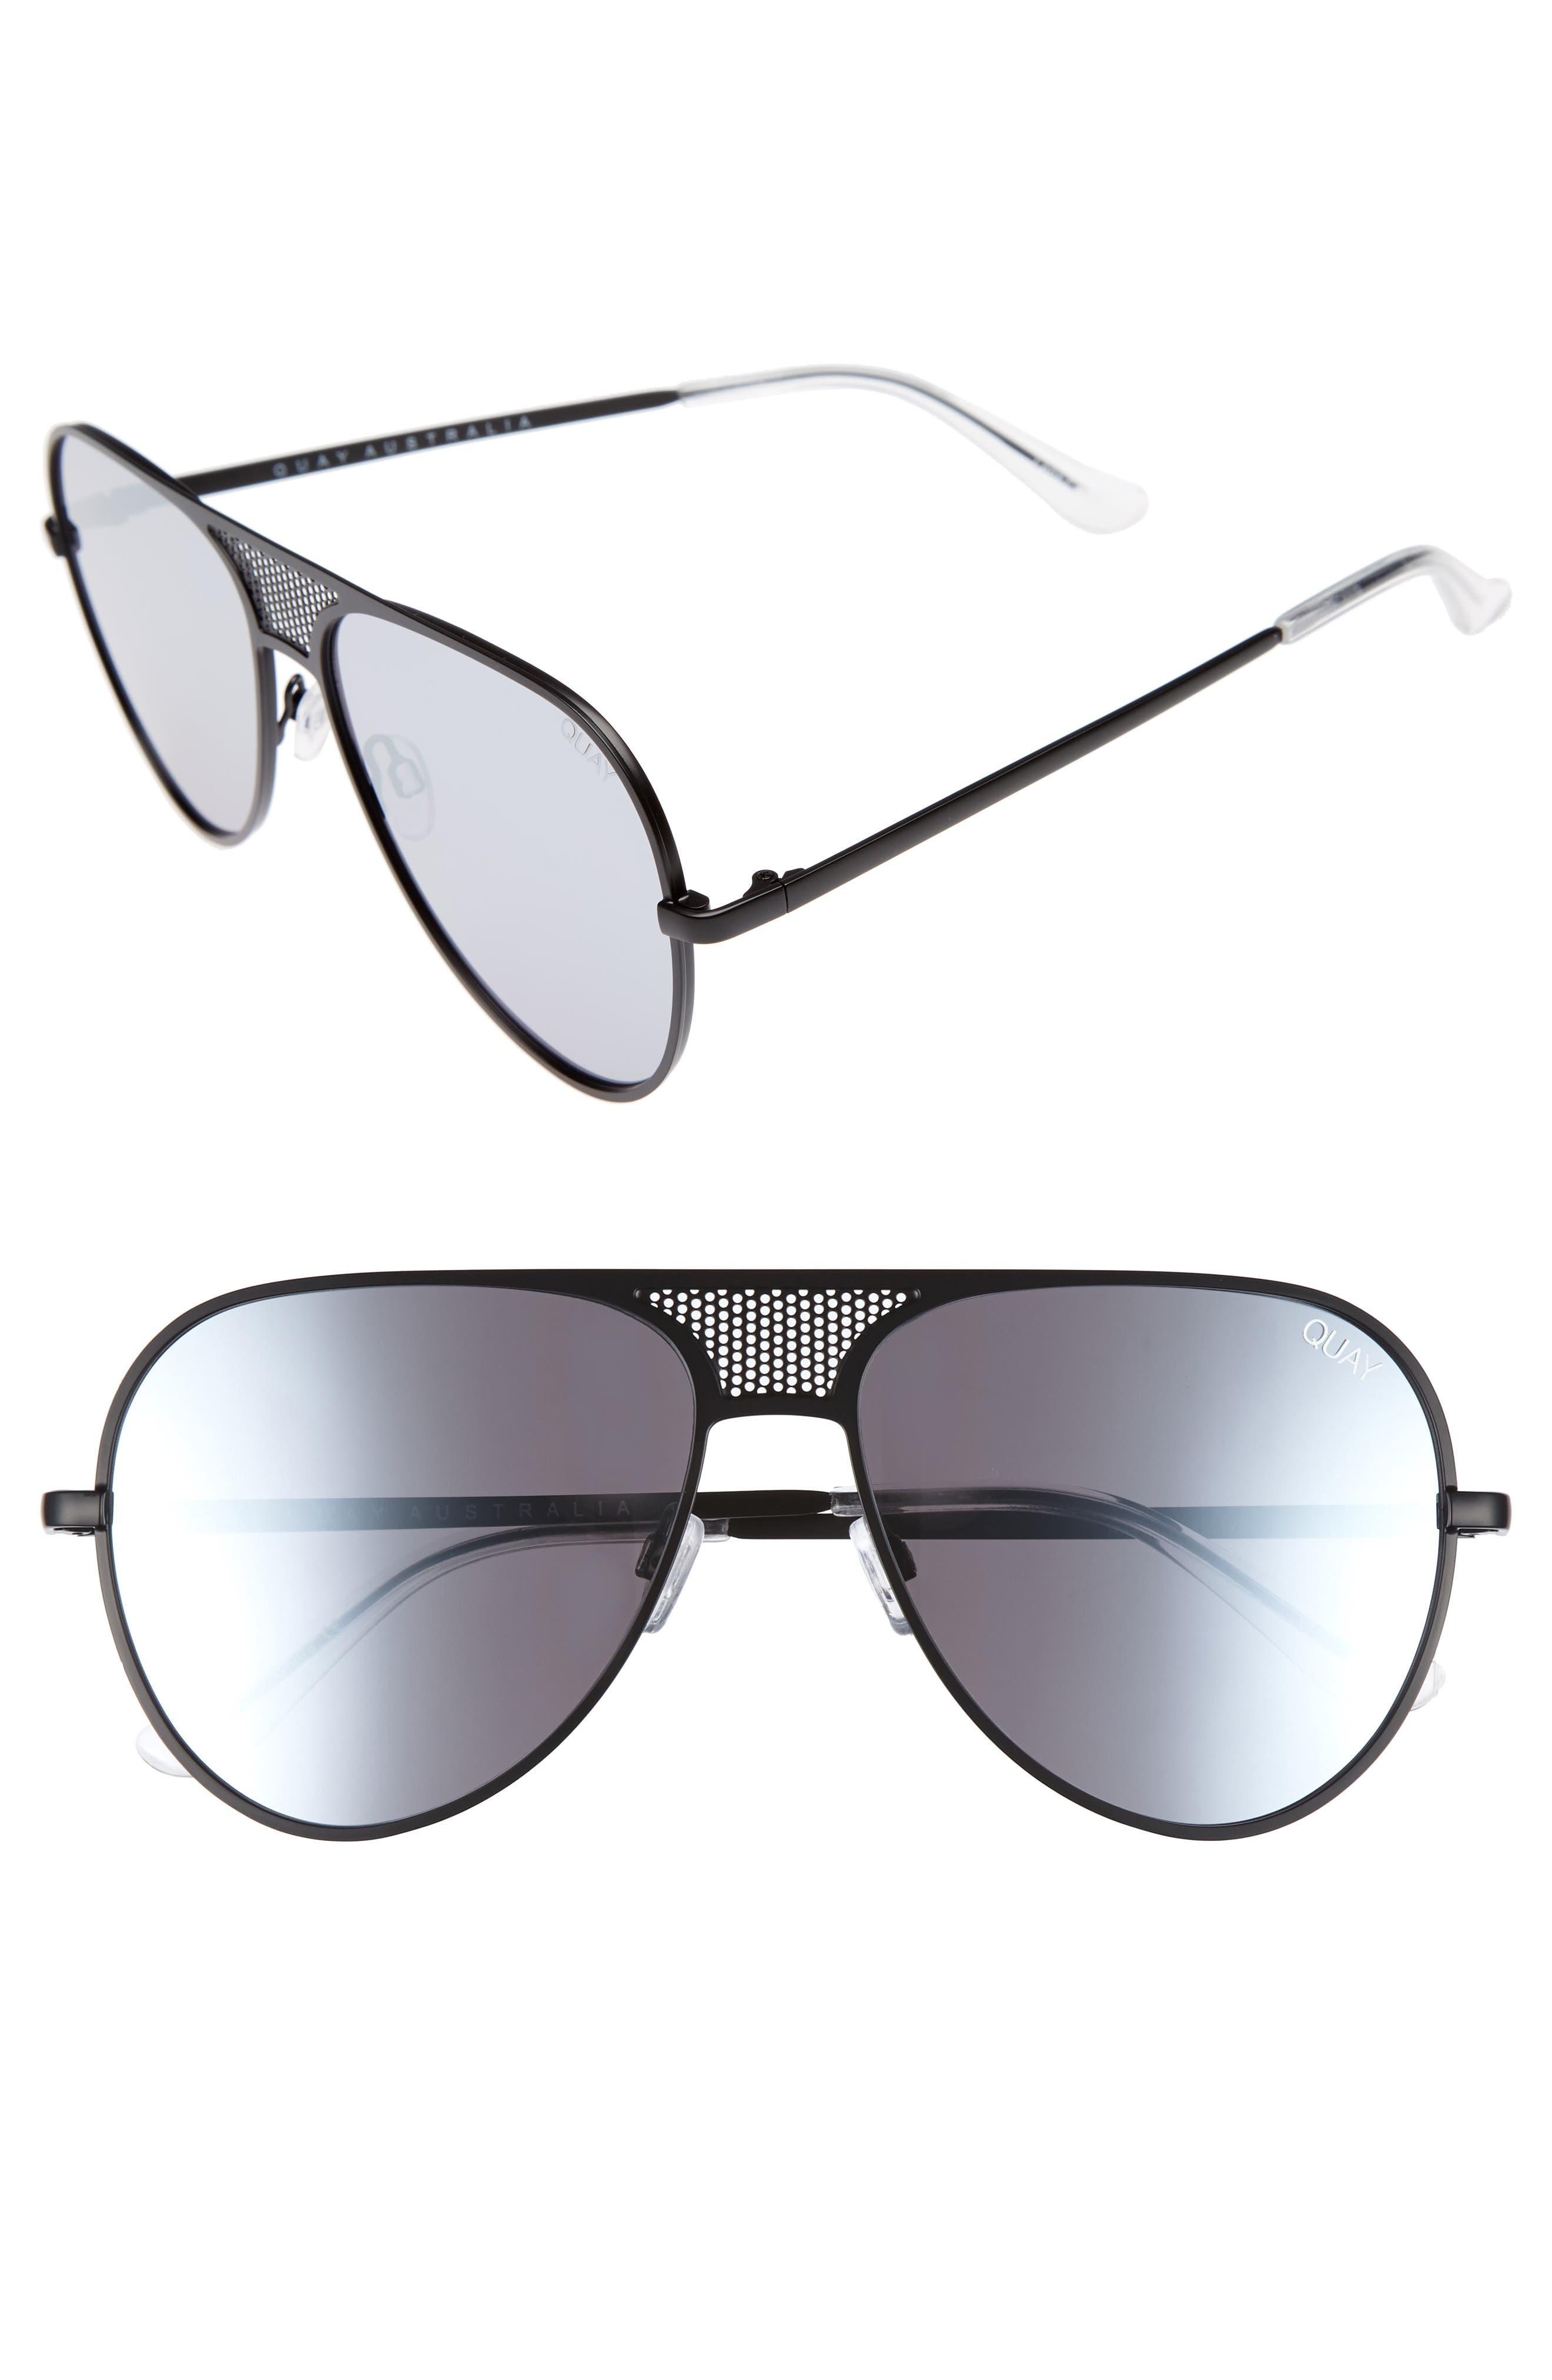 #QUAYxKYLIE Iconic 60mm Aviator Sunglasses